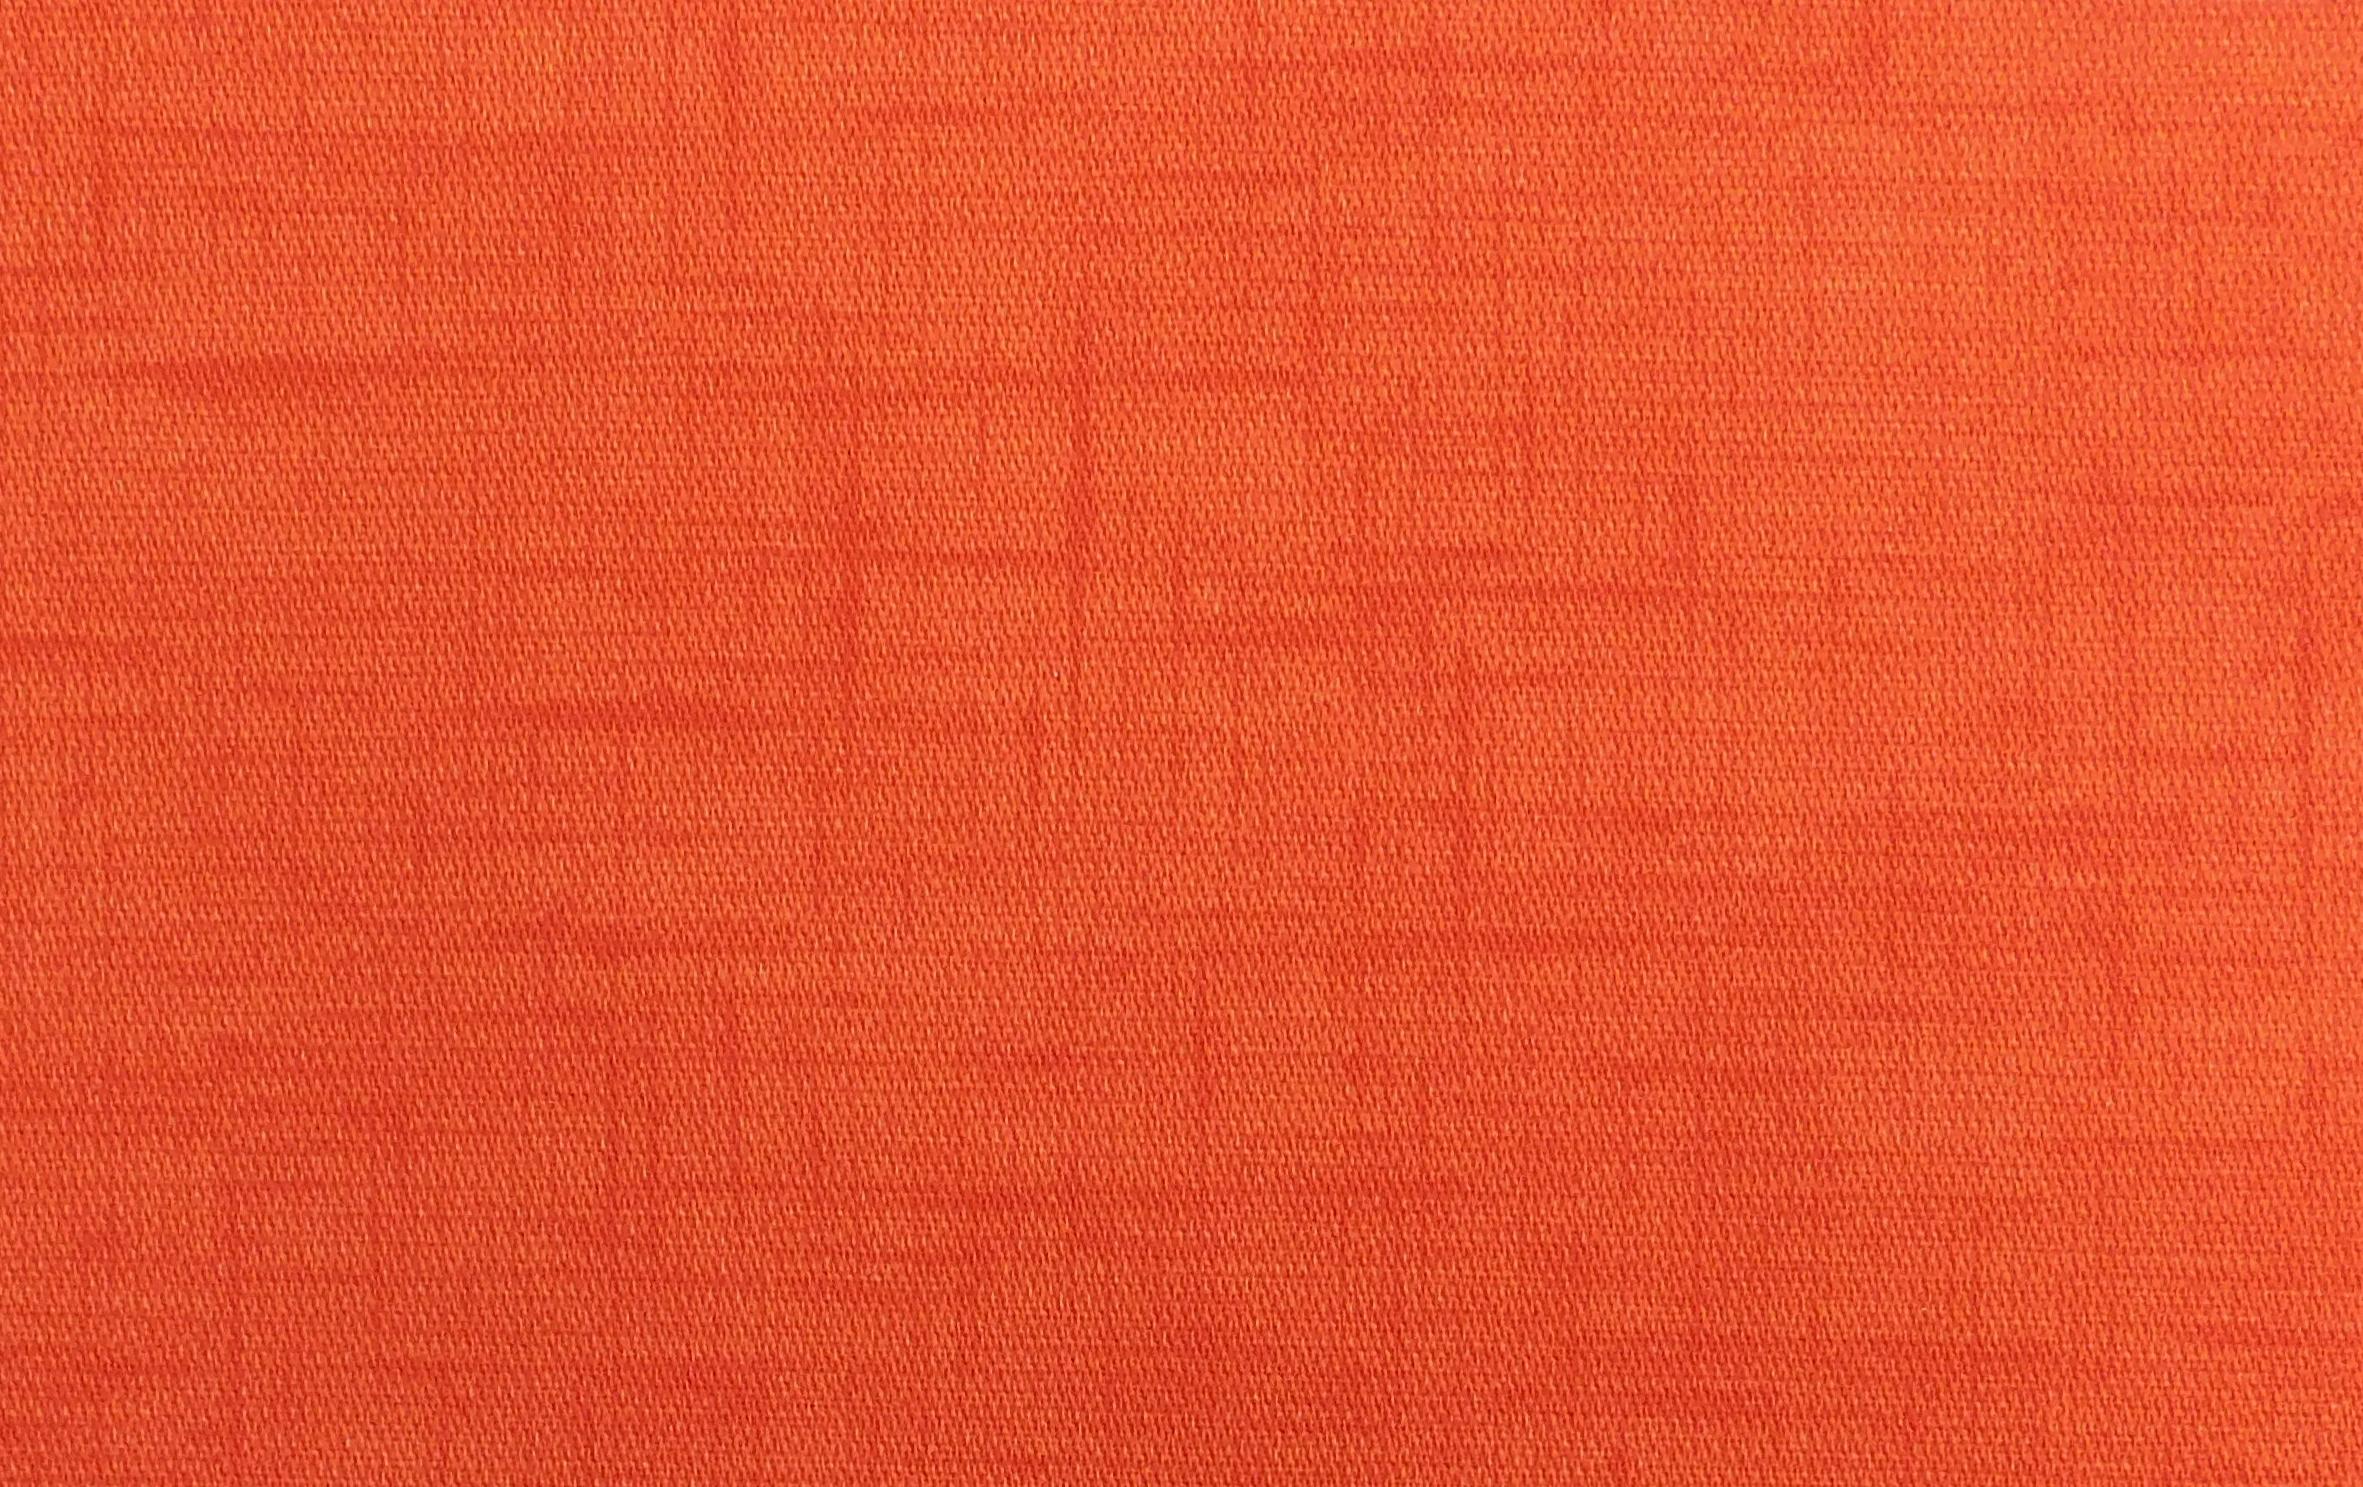 Spectrum Spice FR BO Blind Fabric RA